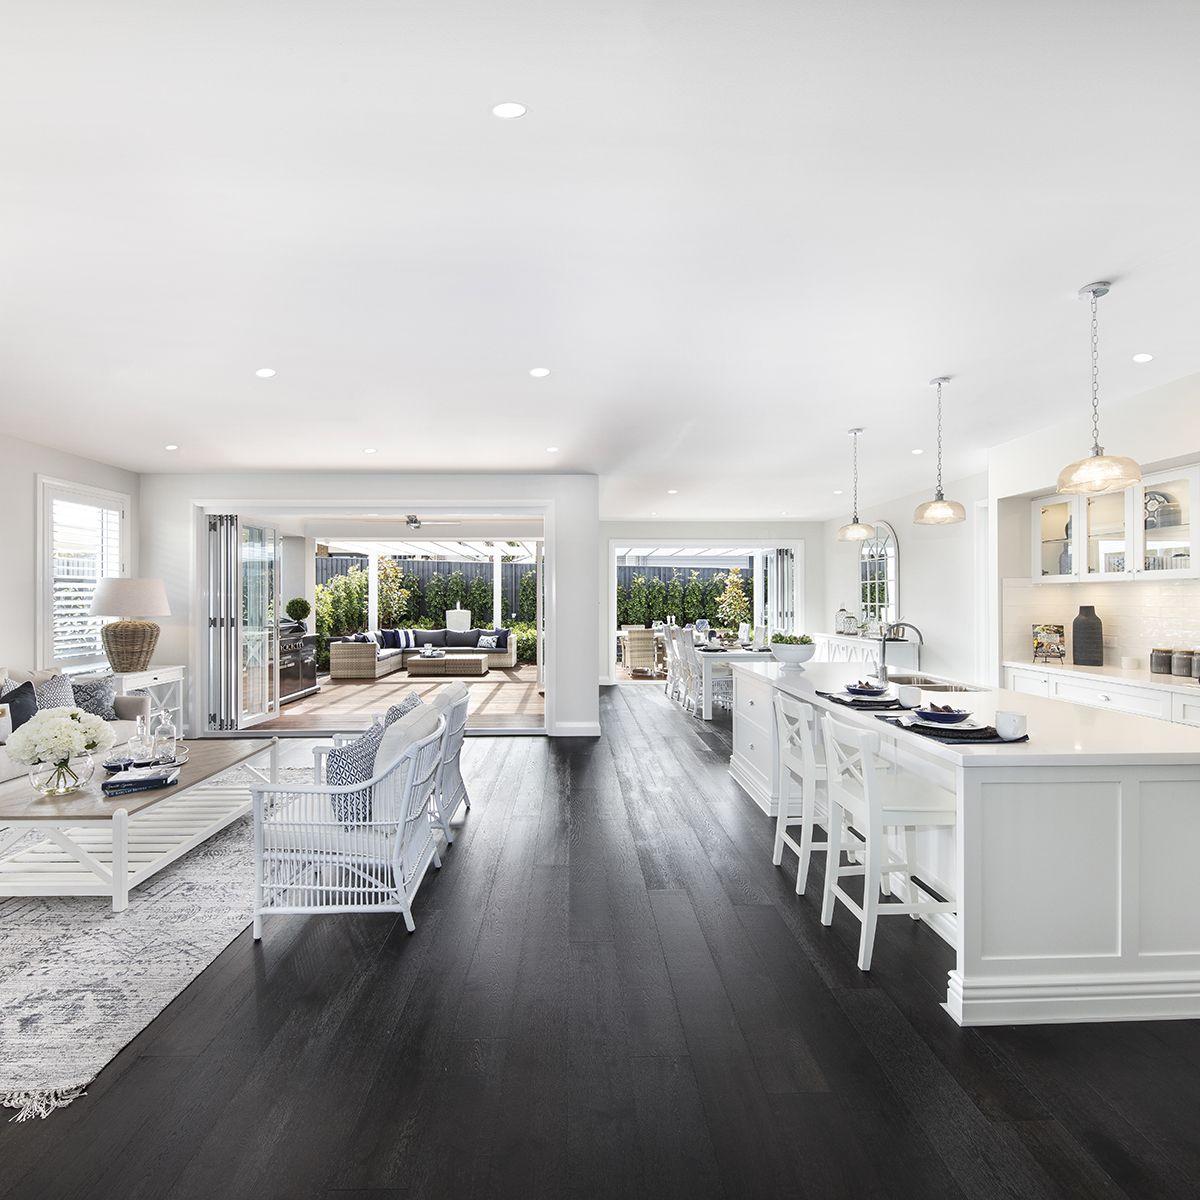 50 Hamptons Interior Design Ideas The Hamptons Interior Design Interior